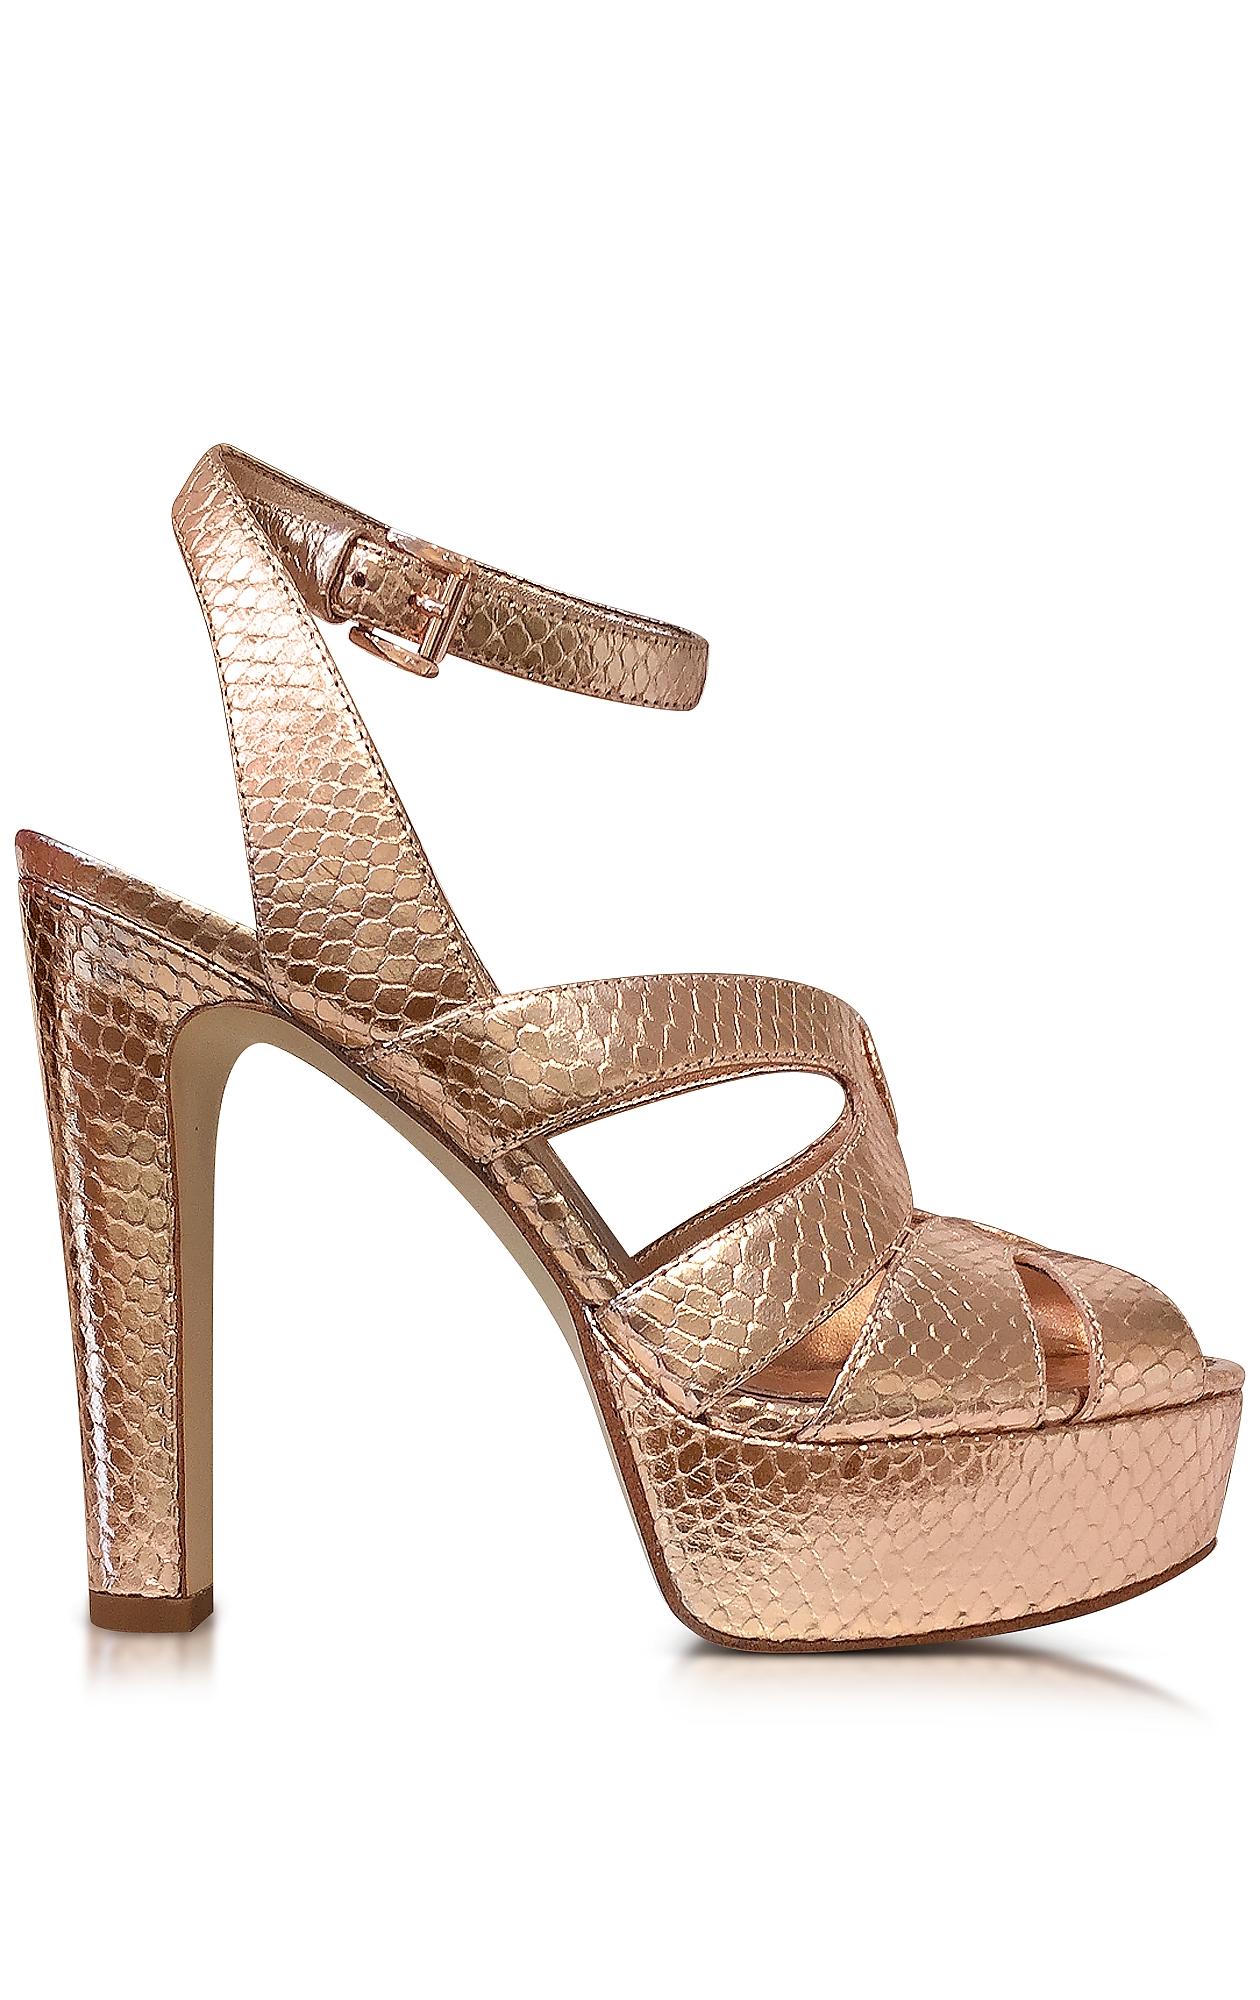 be9bceb69e22 MICHAEL KORS Winona Rose Gold Reptile Printed Leather Platform Sandal